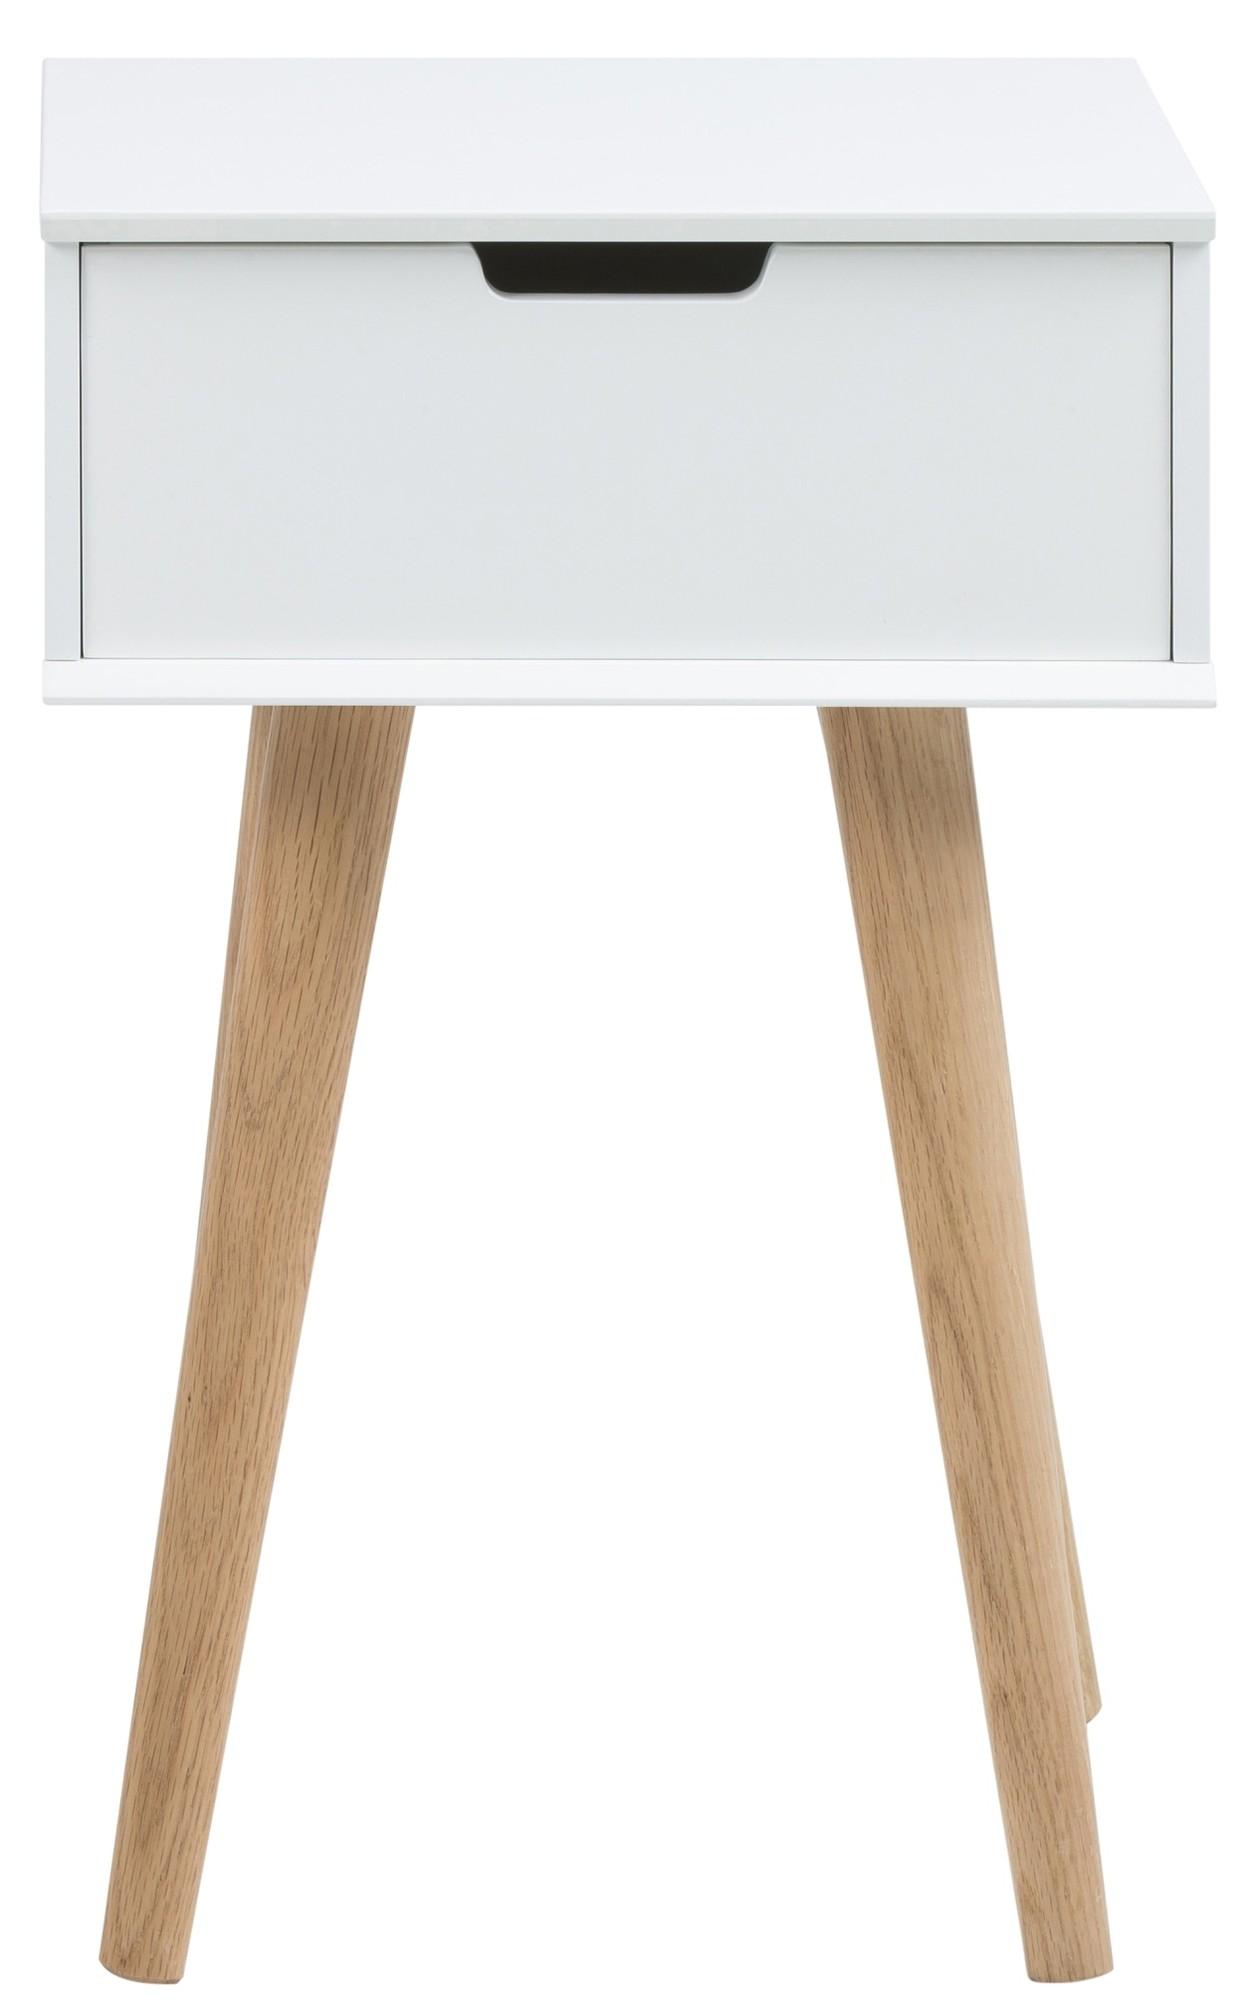 Ethnicraft oak madra nachtkast 60 x 27 cm ethnicraft in de aanbieding kopen - Wit hout nachtkastje ...